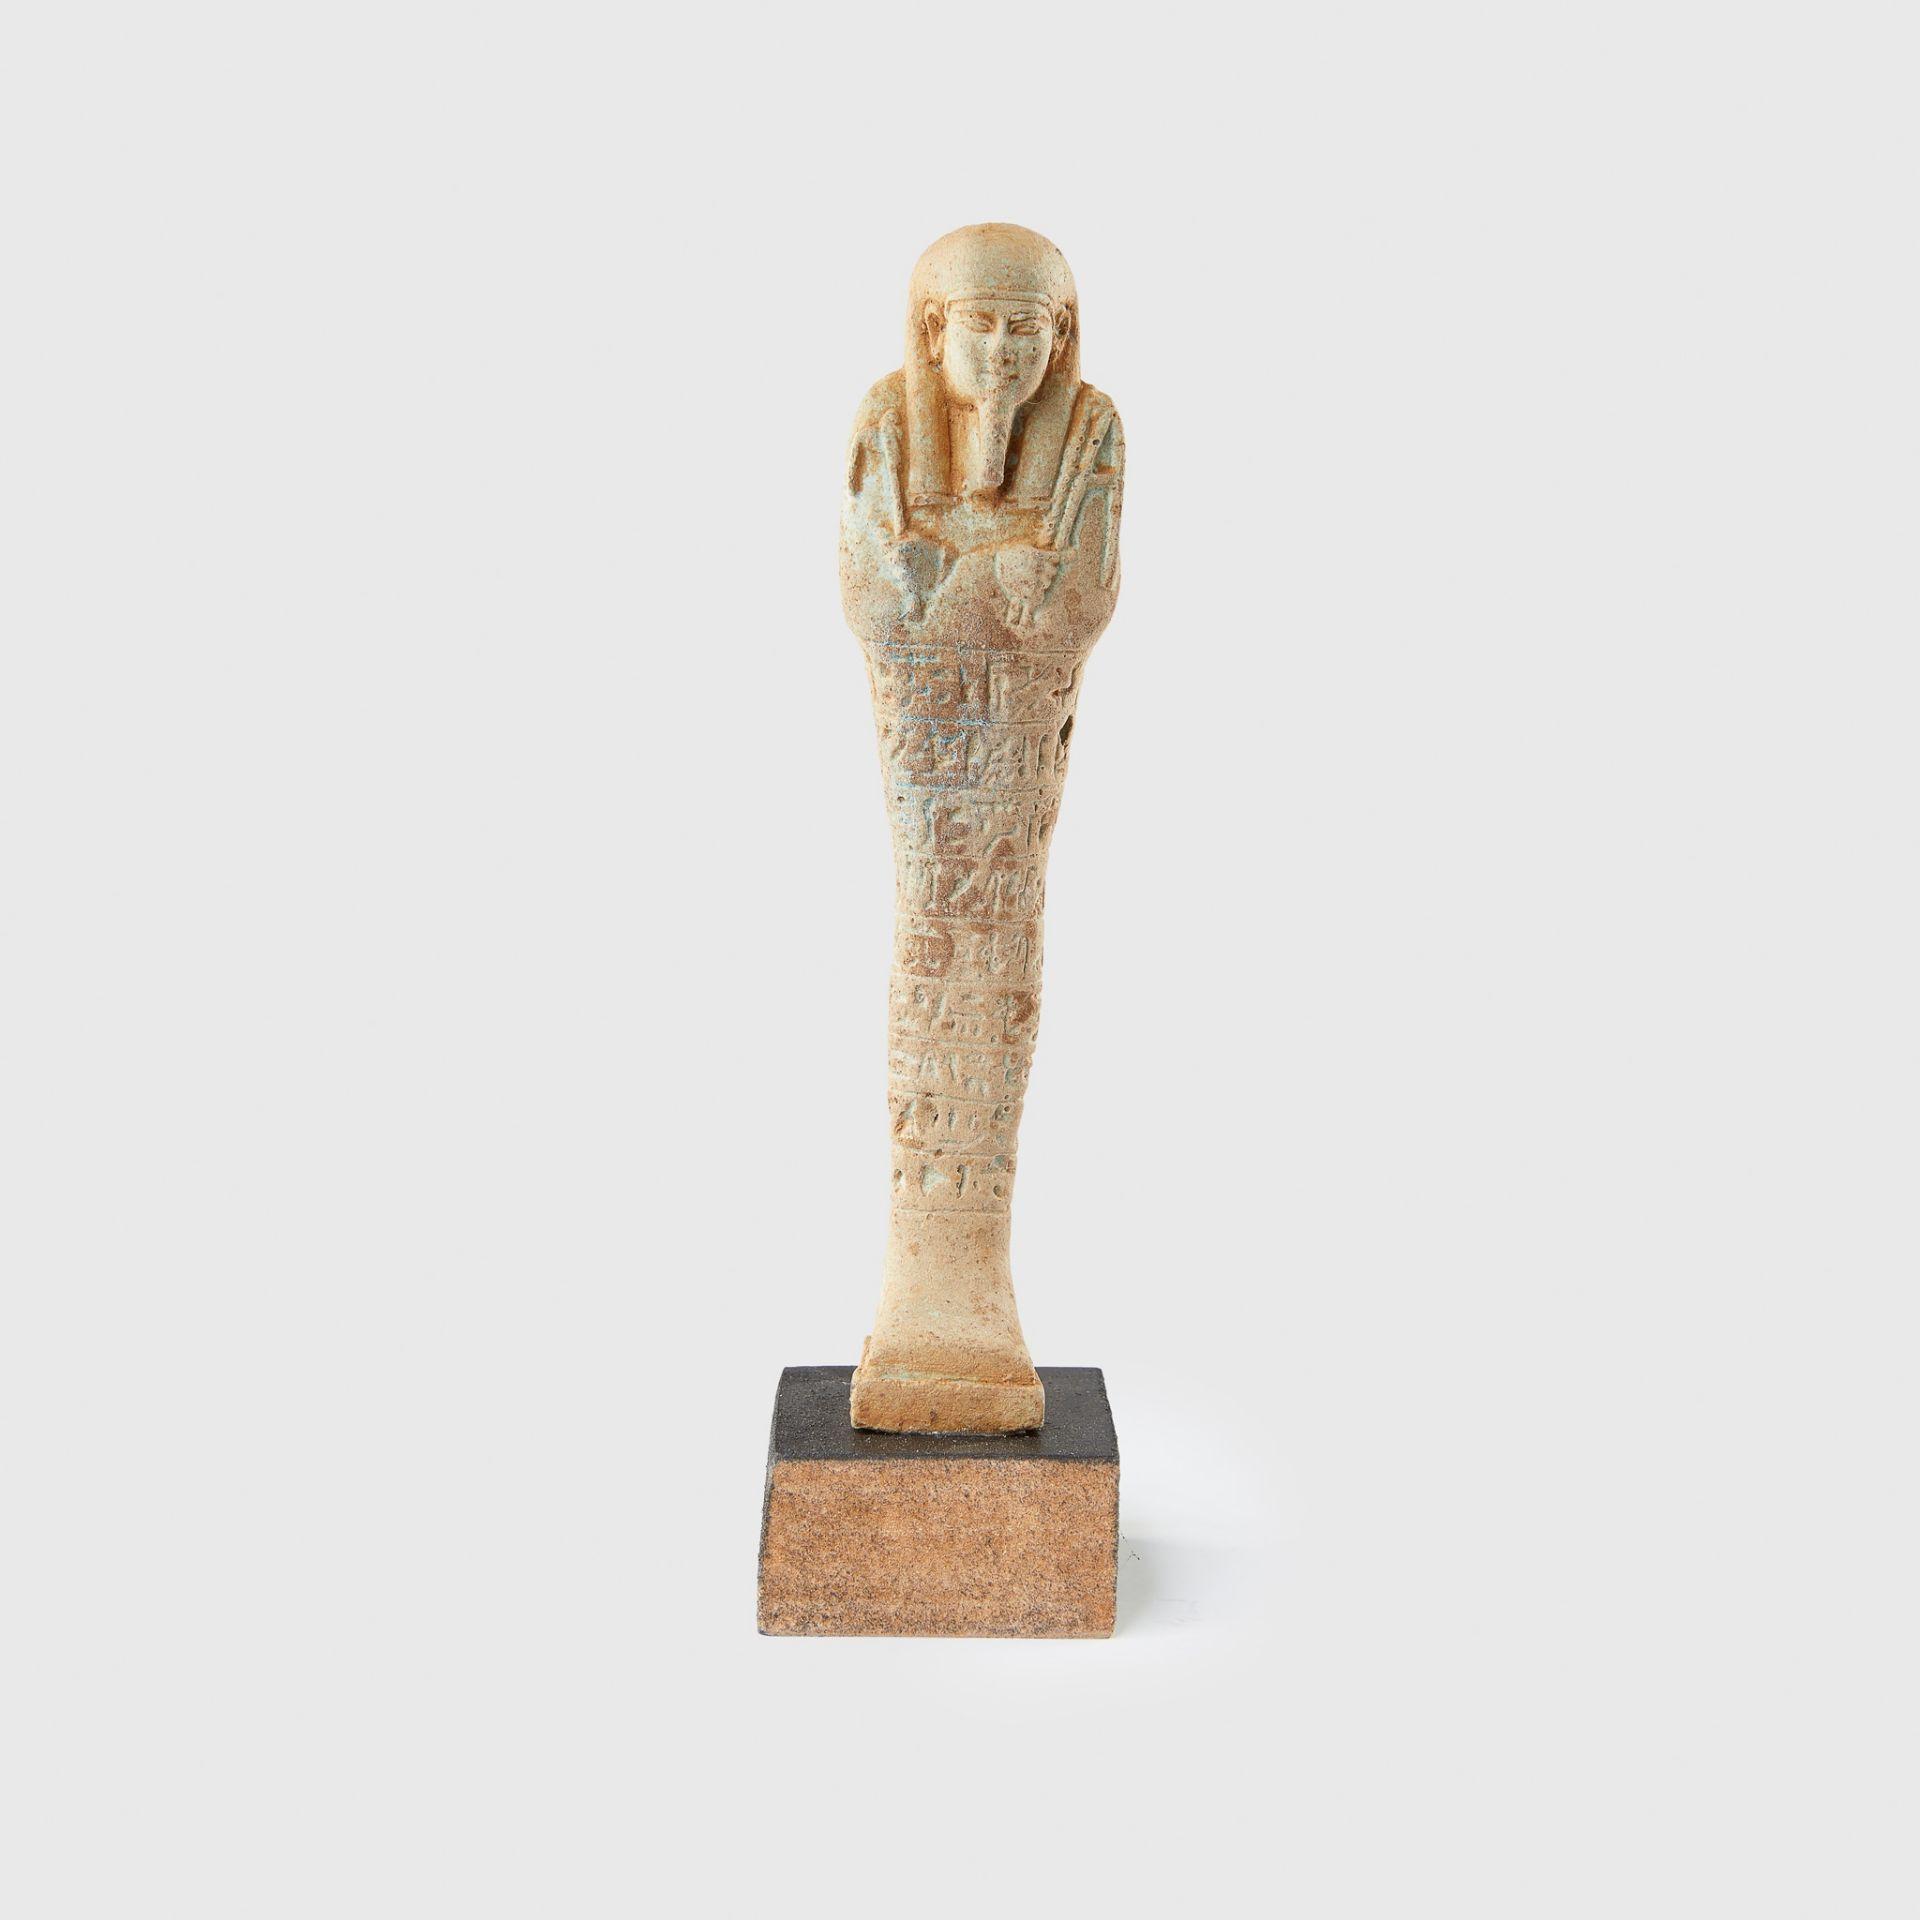 SHABTI EGYPT, LATE PERIOD c. 664 - 332 B.C.